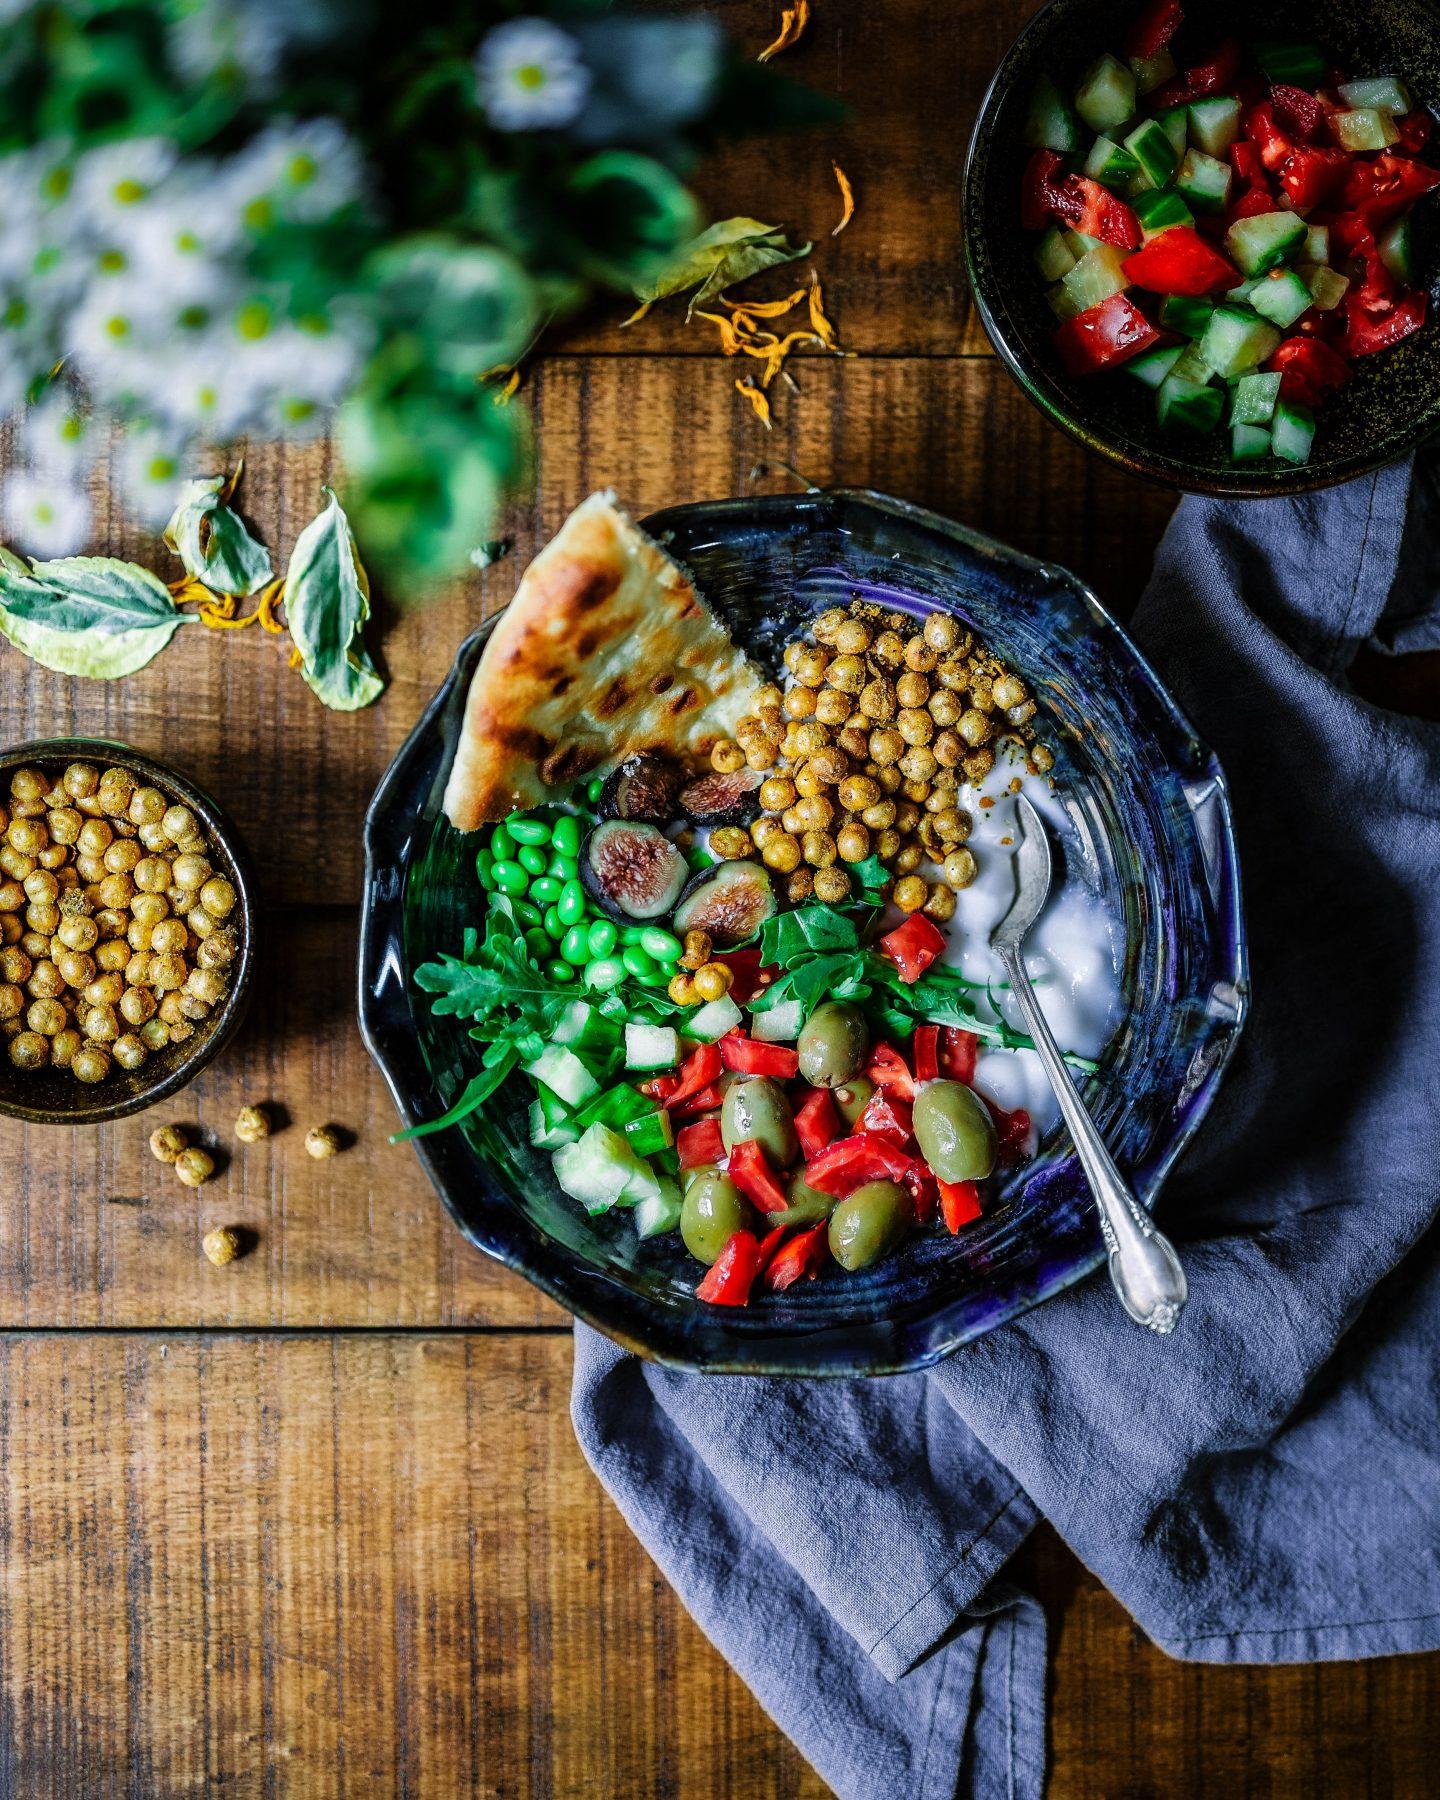 vegetarian or vegan meal with bread, lots of veggies, tips for vegan and vegetarian travellers